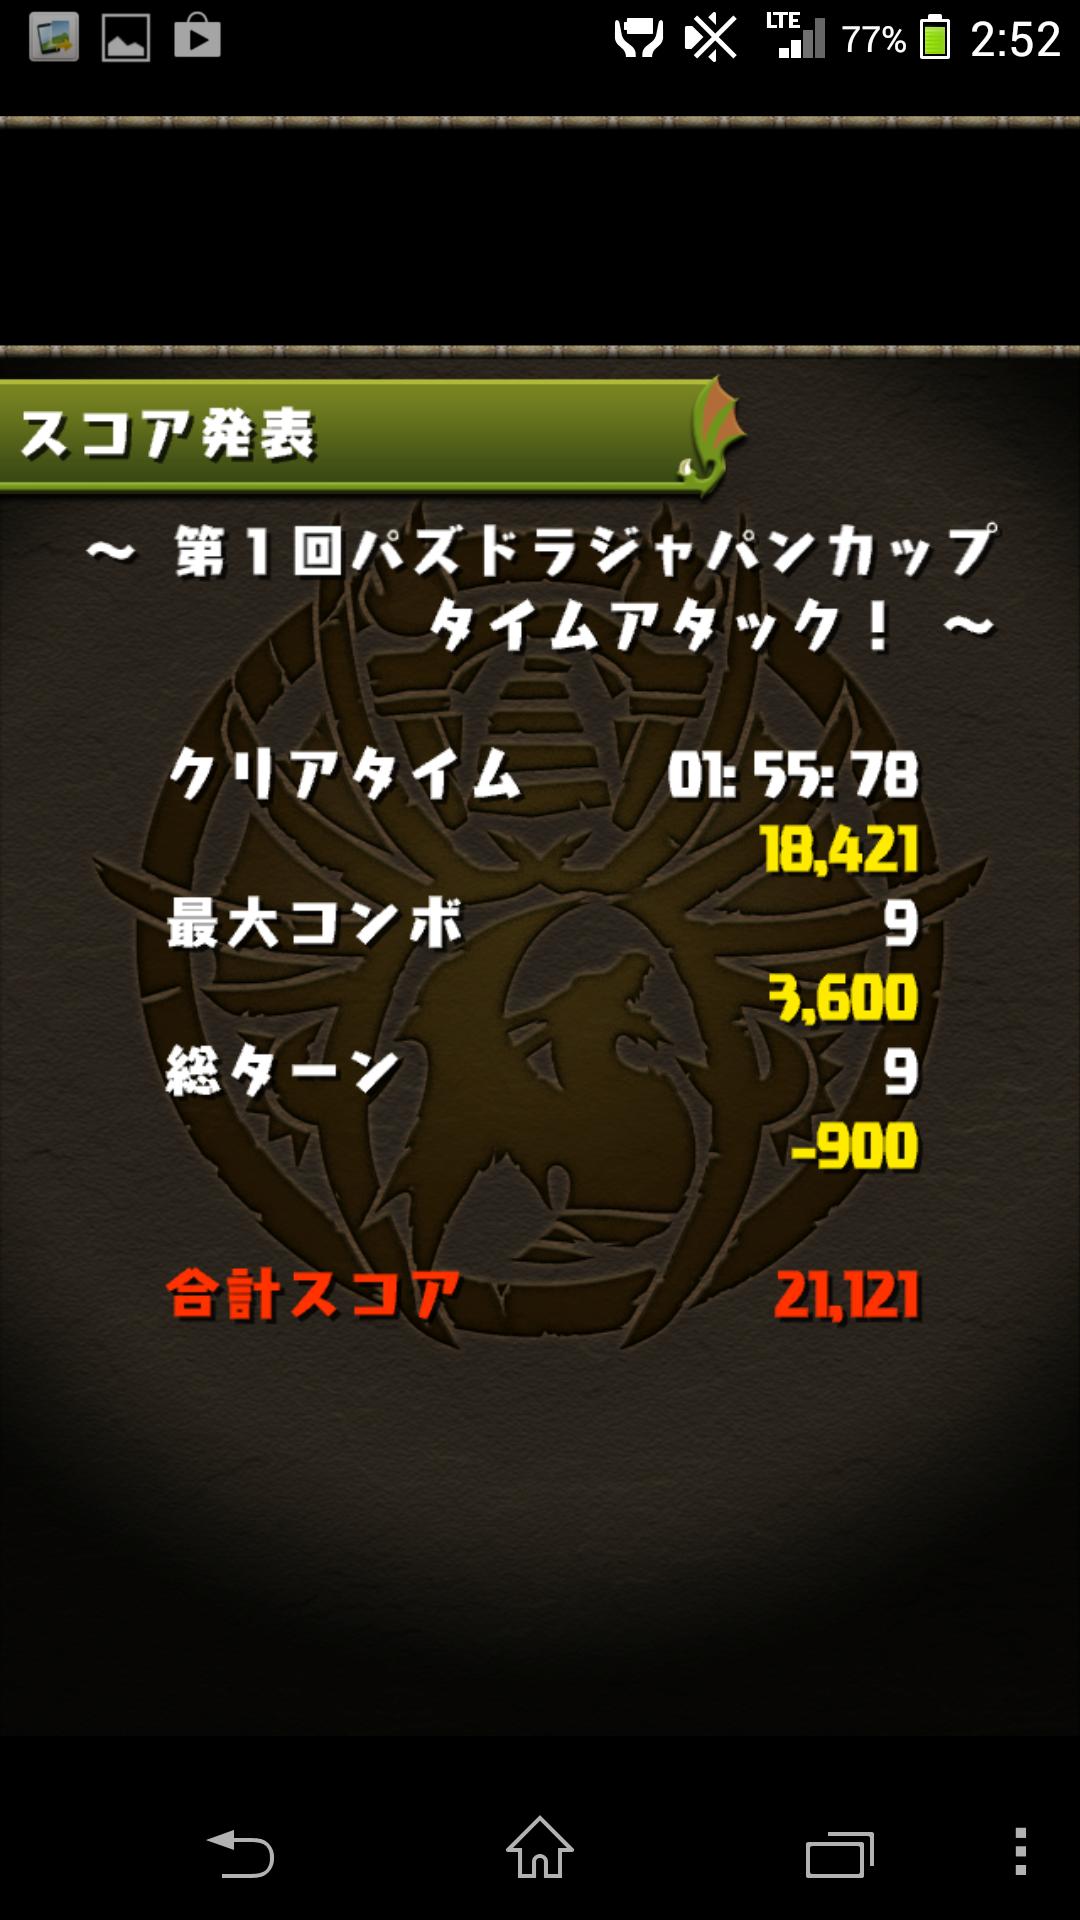 Screenshot_2014-05-02-02-52-51.png